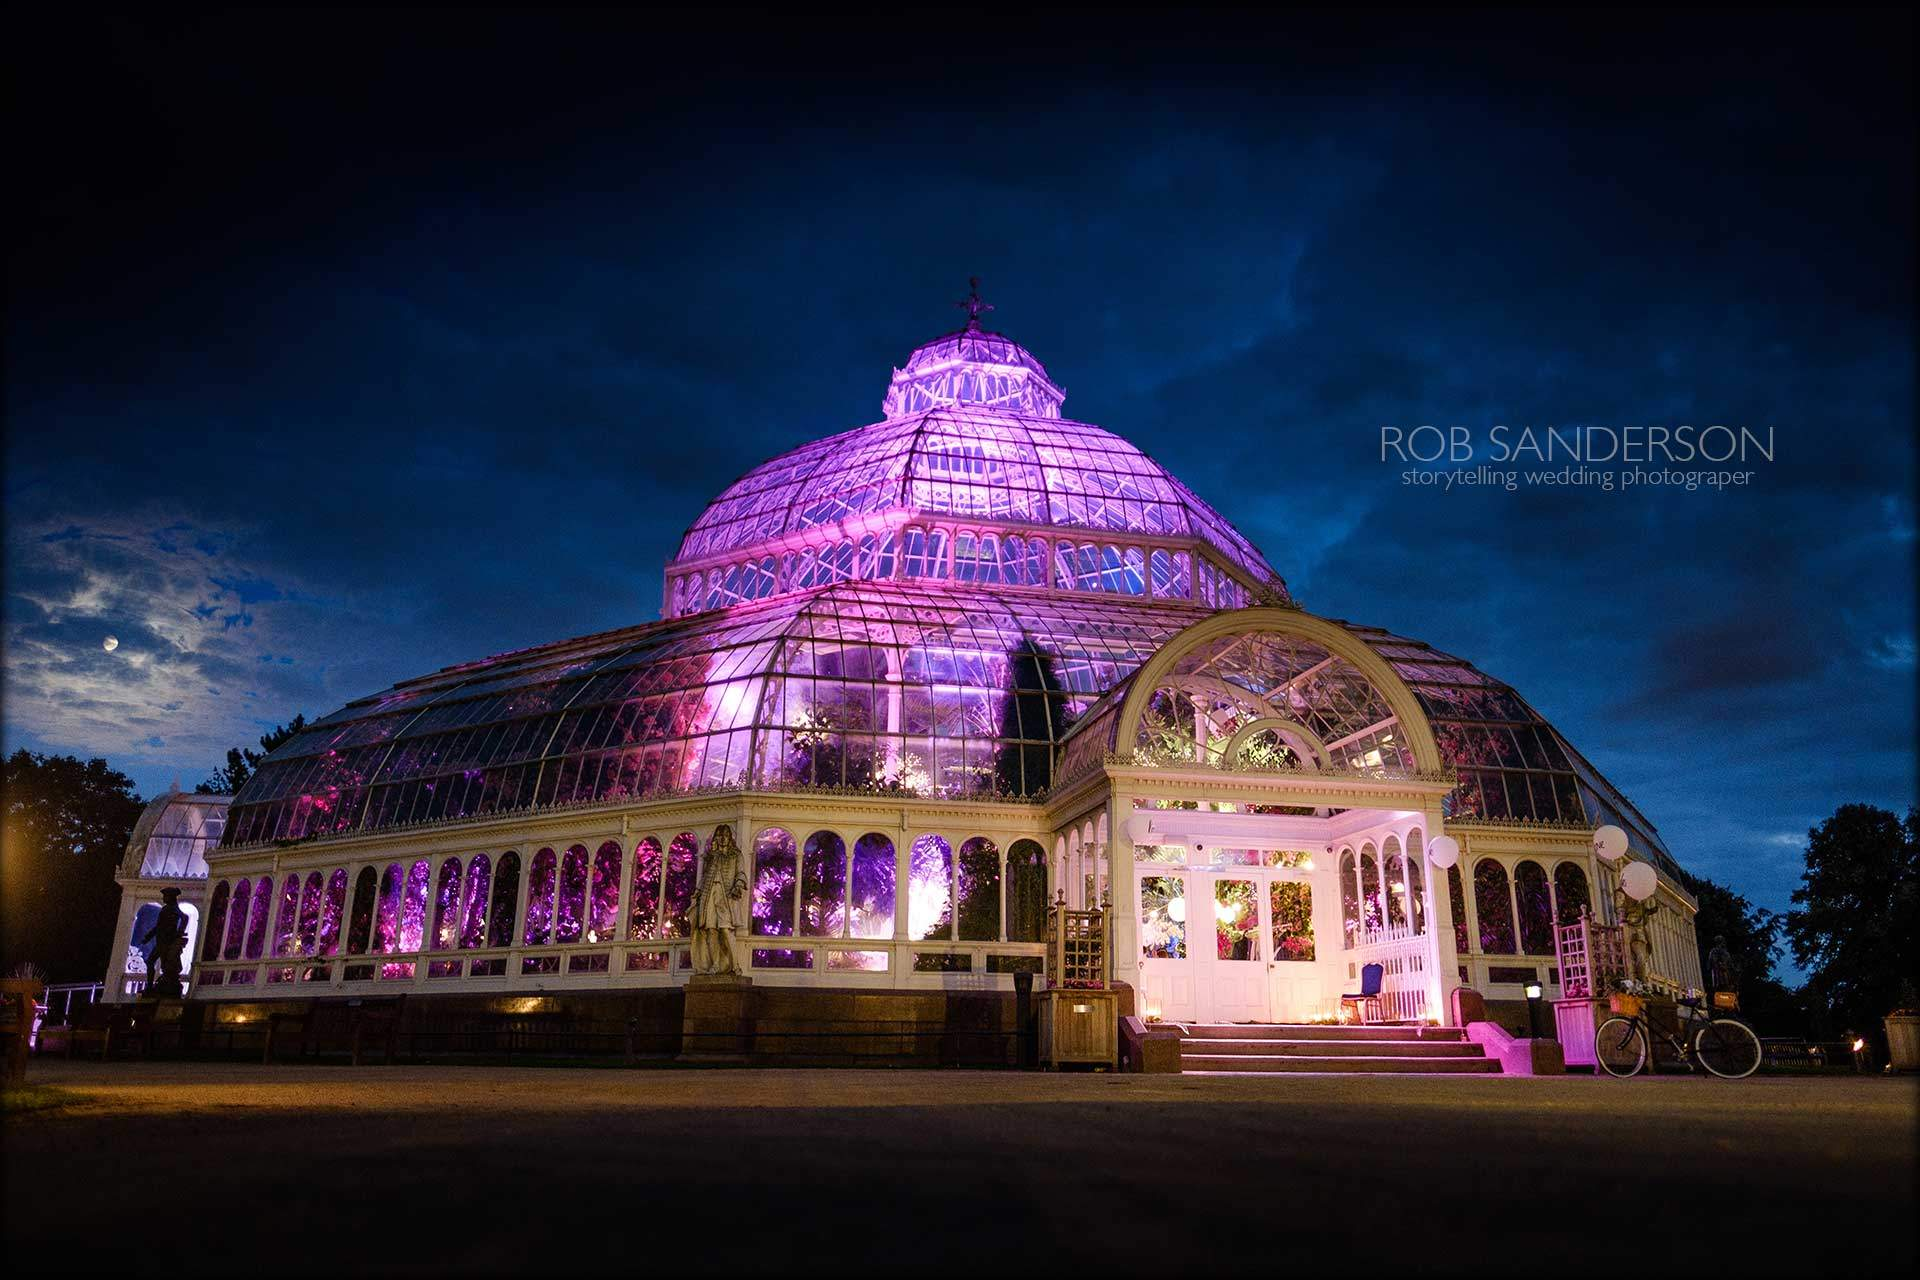 Sefton Park Palm House lit up at night